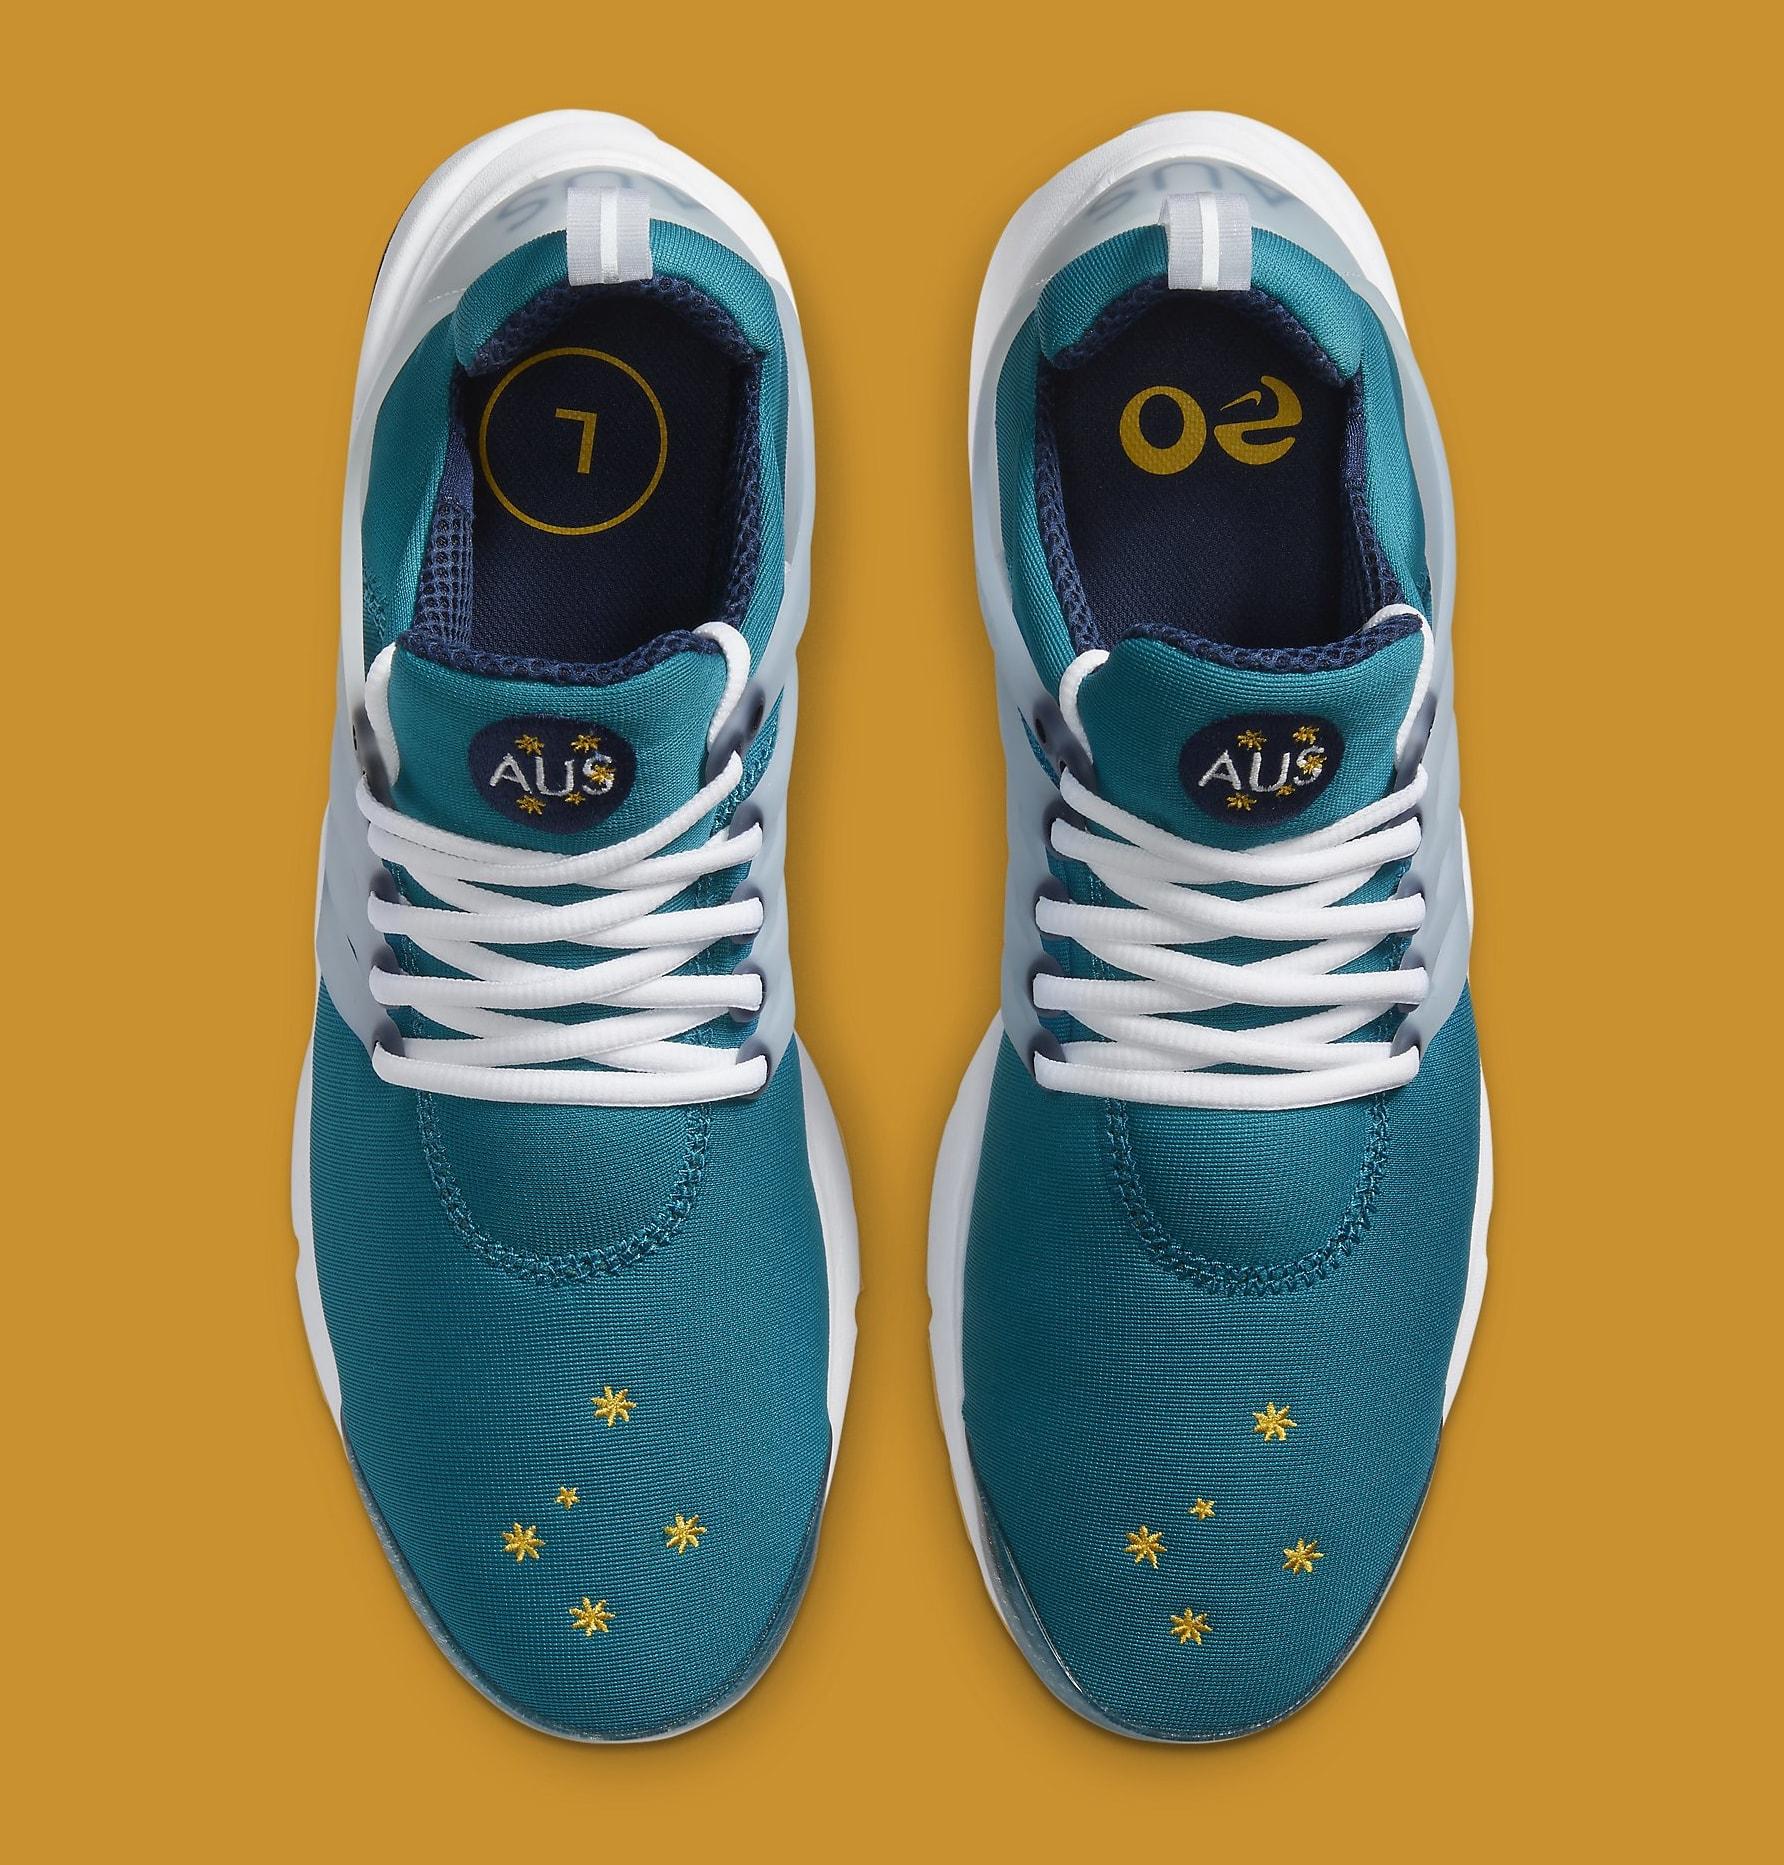 Nike Air Presto 'Australia' 2020 CJ1229-301 Top